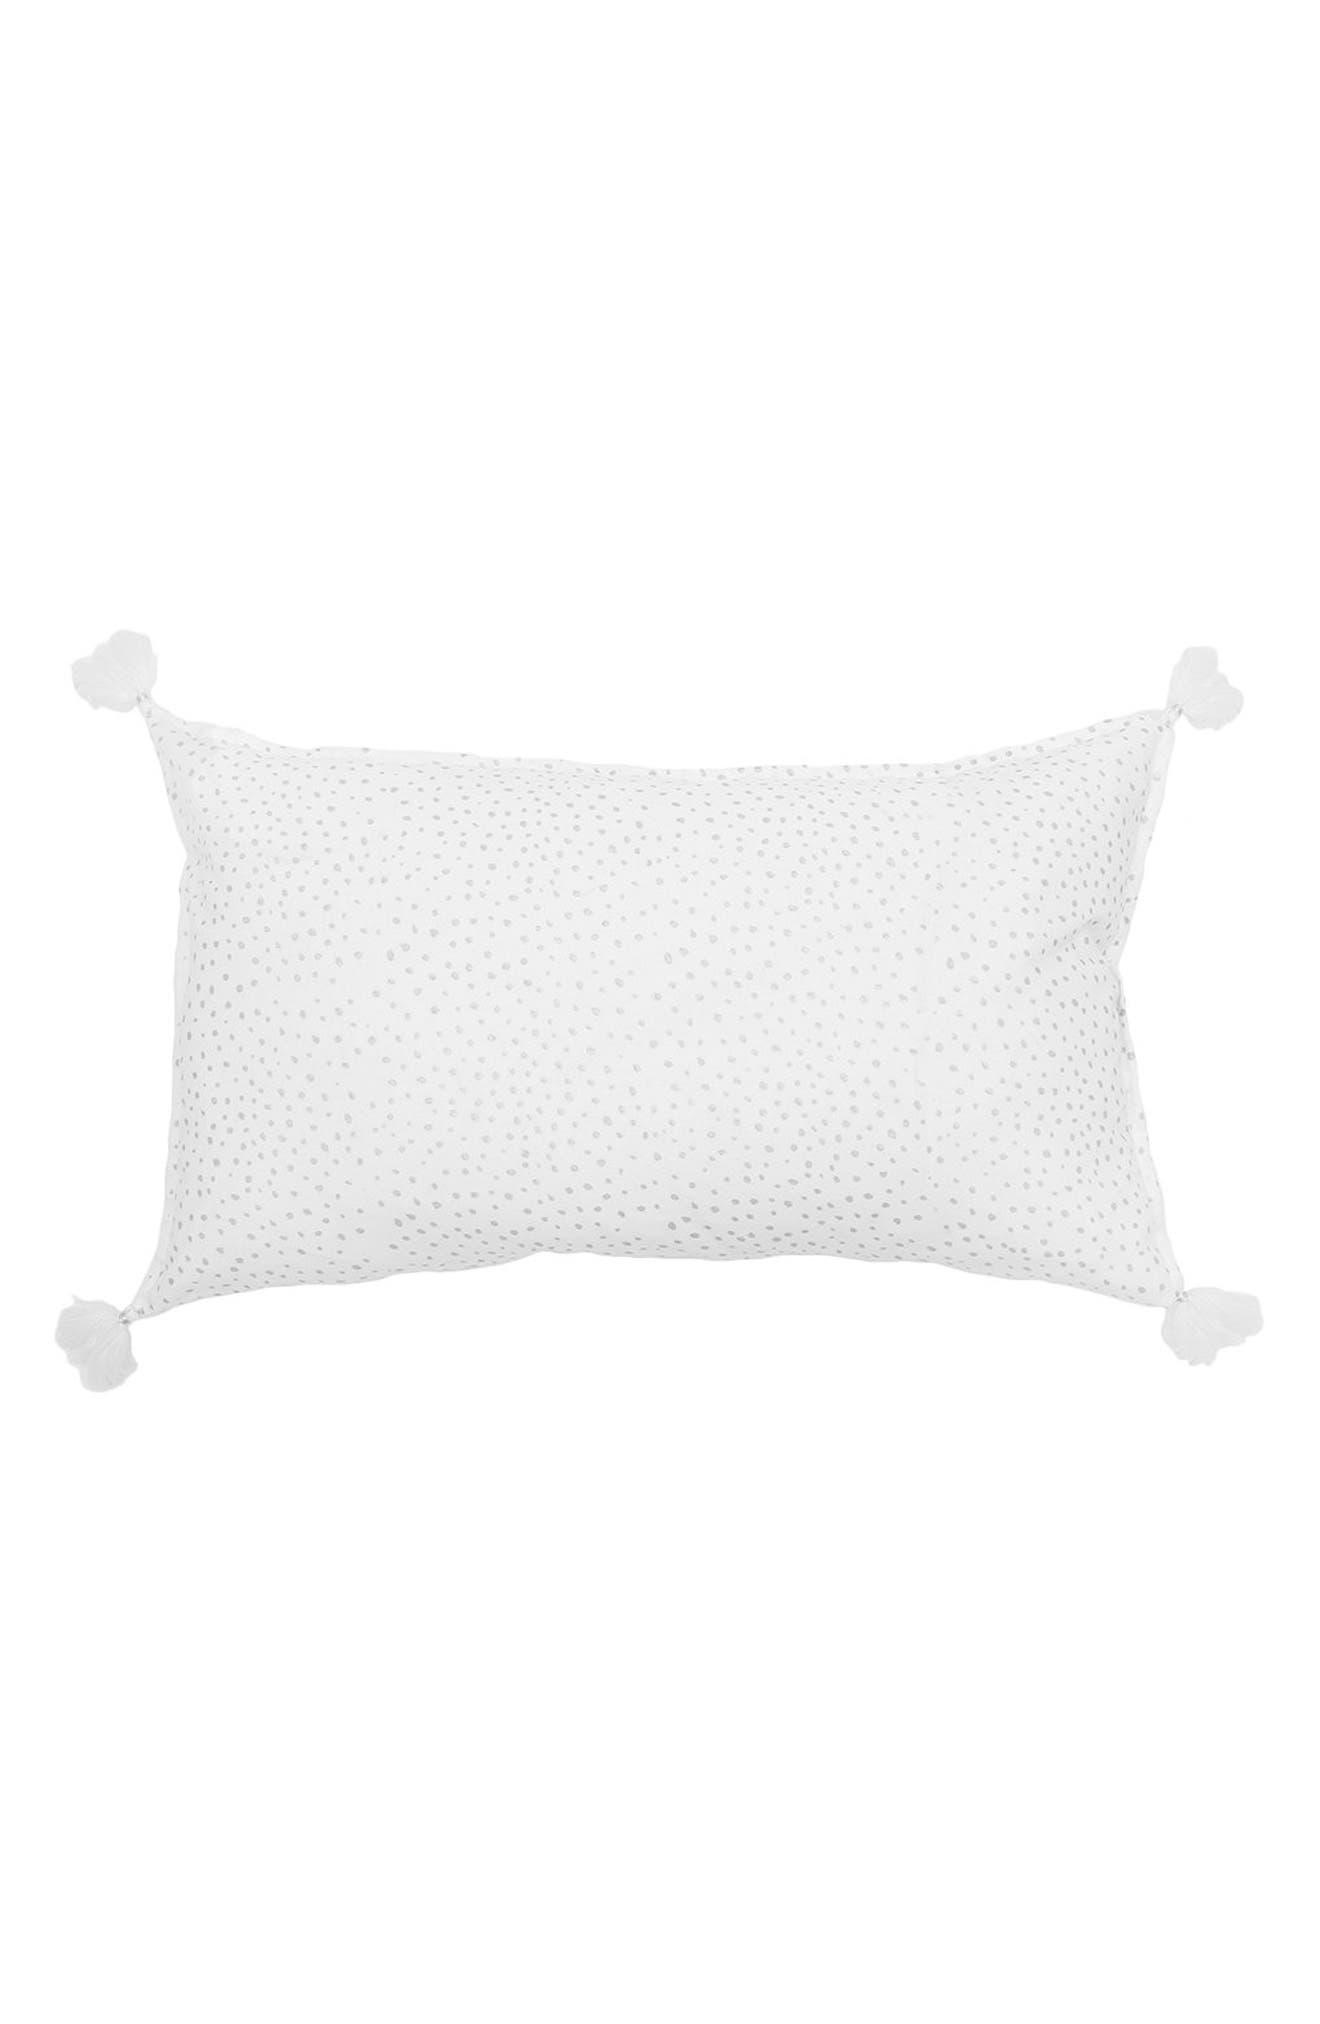 Dot Accent Pillow,                             Main thumbnail 1, color,                             Silver